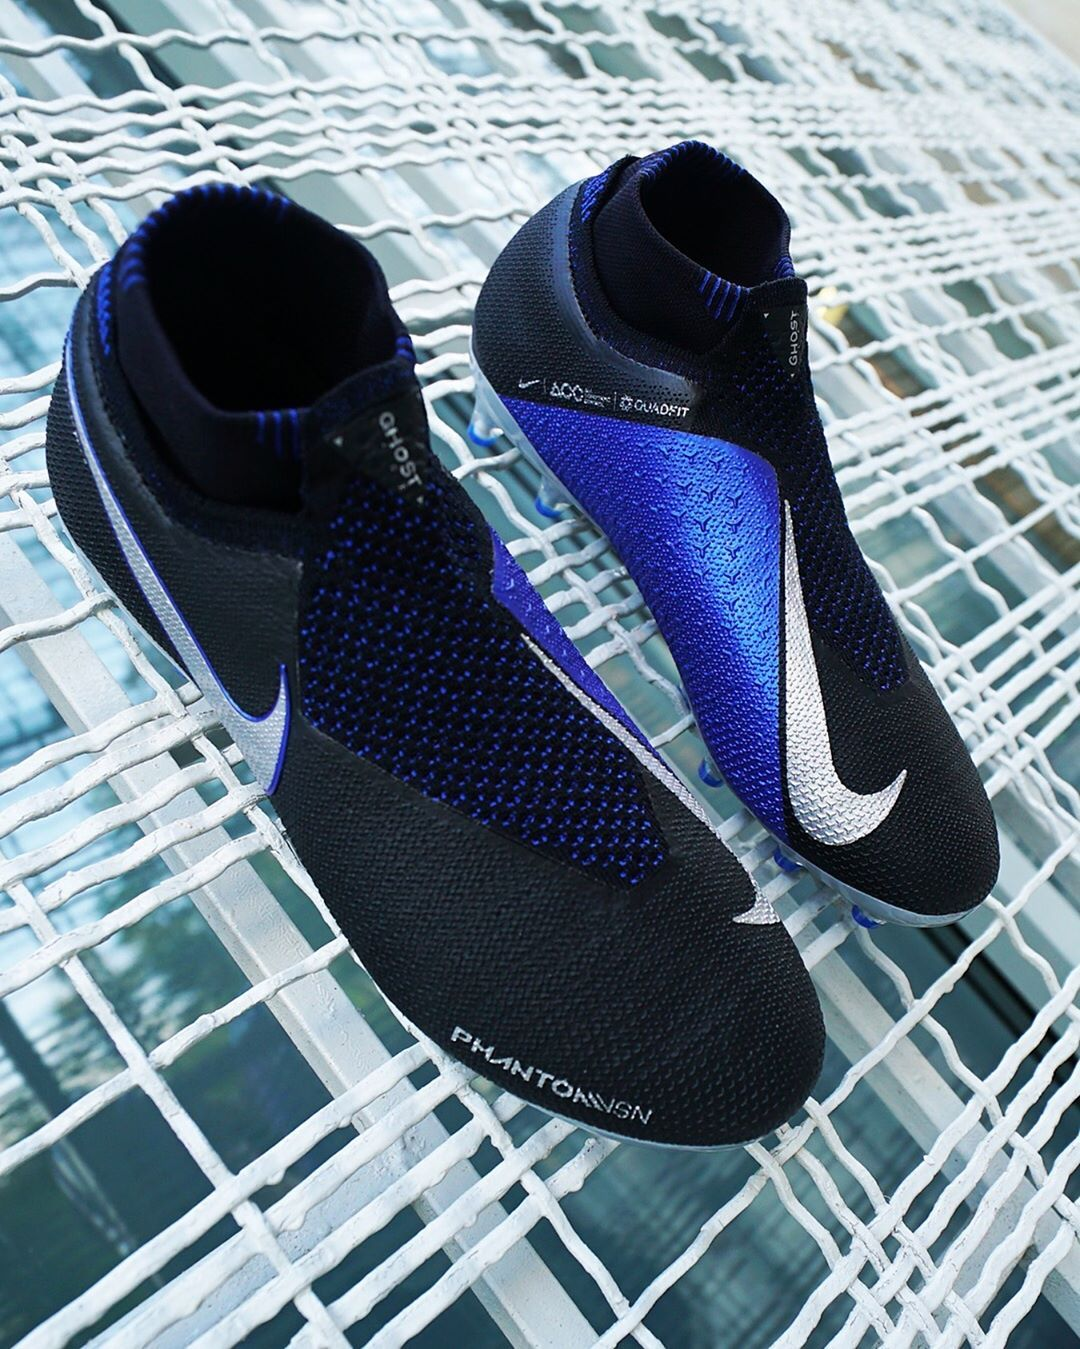 Botas de fútbol con tobillera Nike Phantom Vision Elite - negras y azules  Las  PhantomVsn cbdf49727